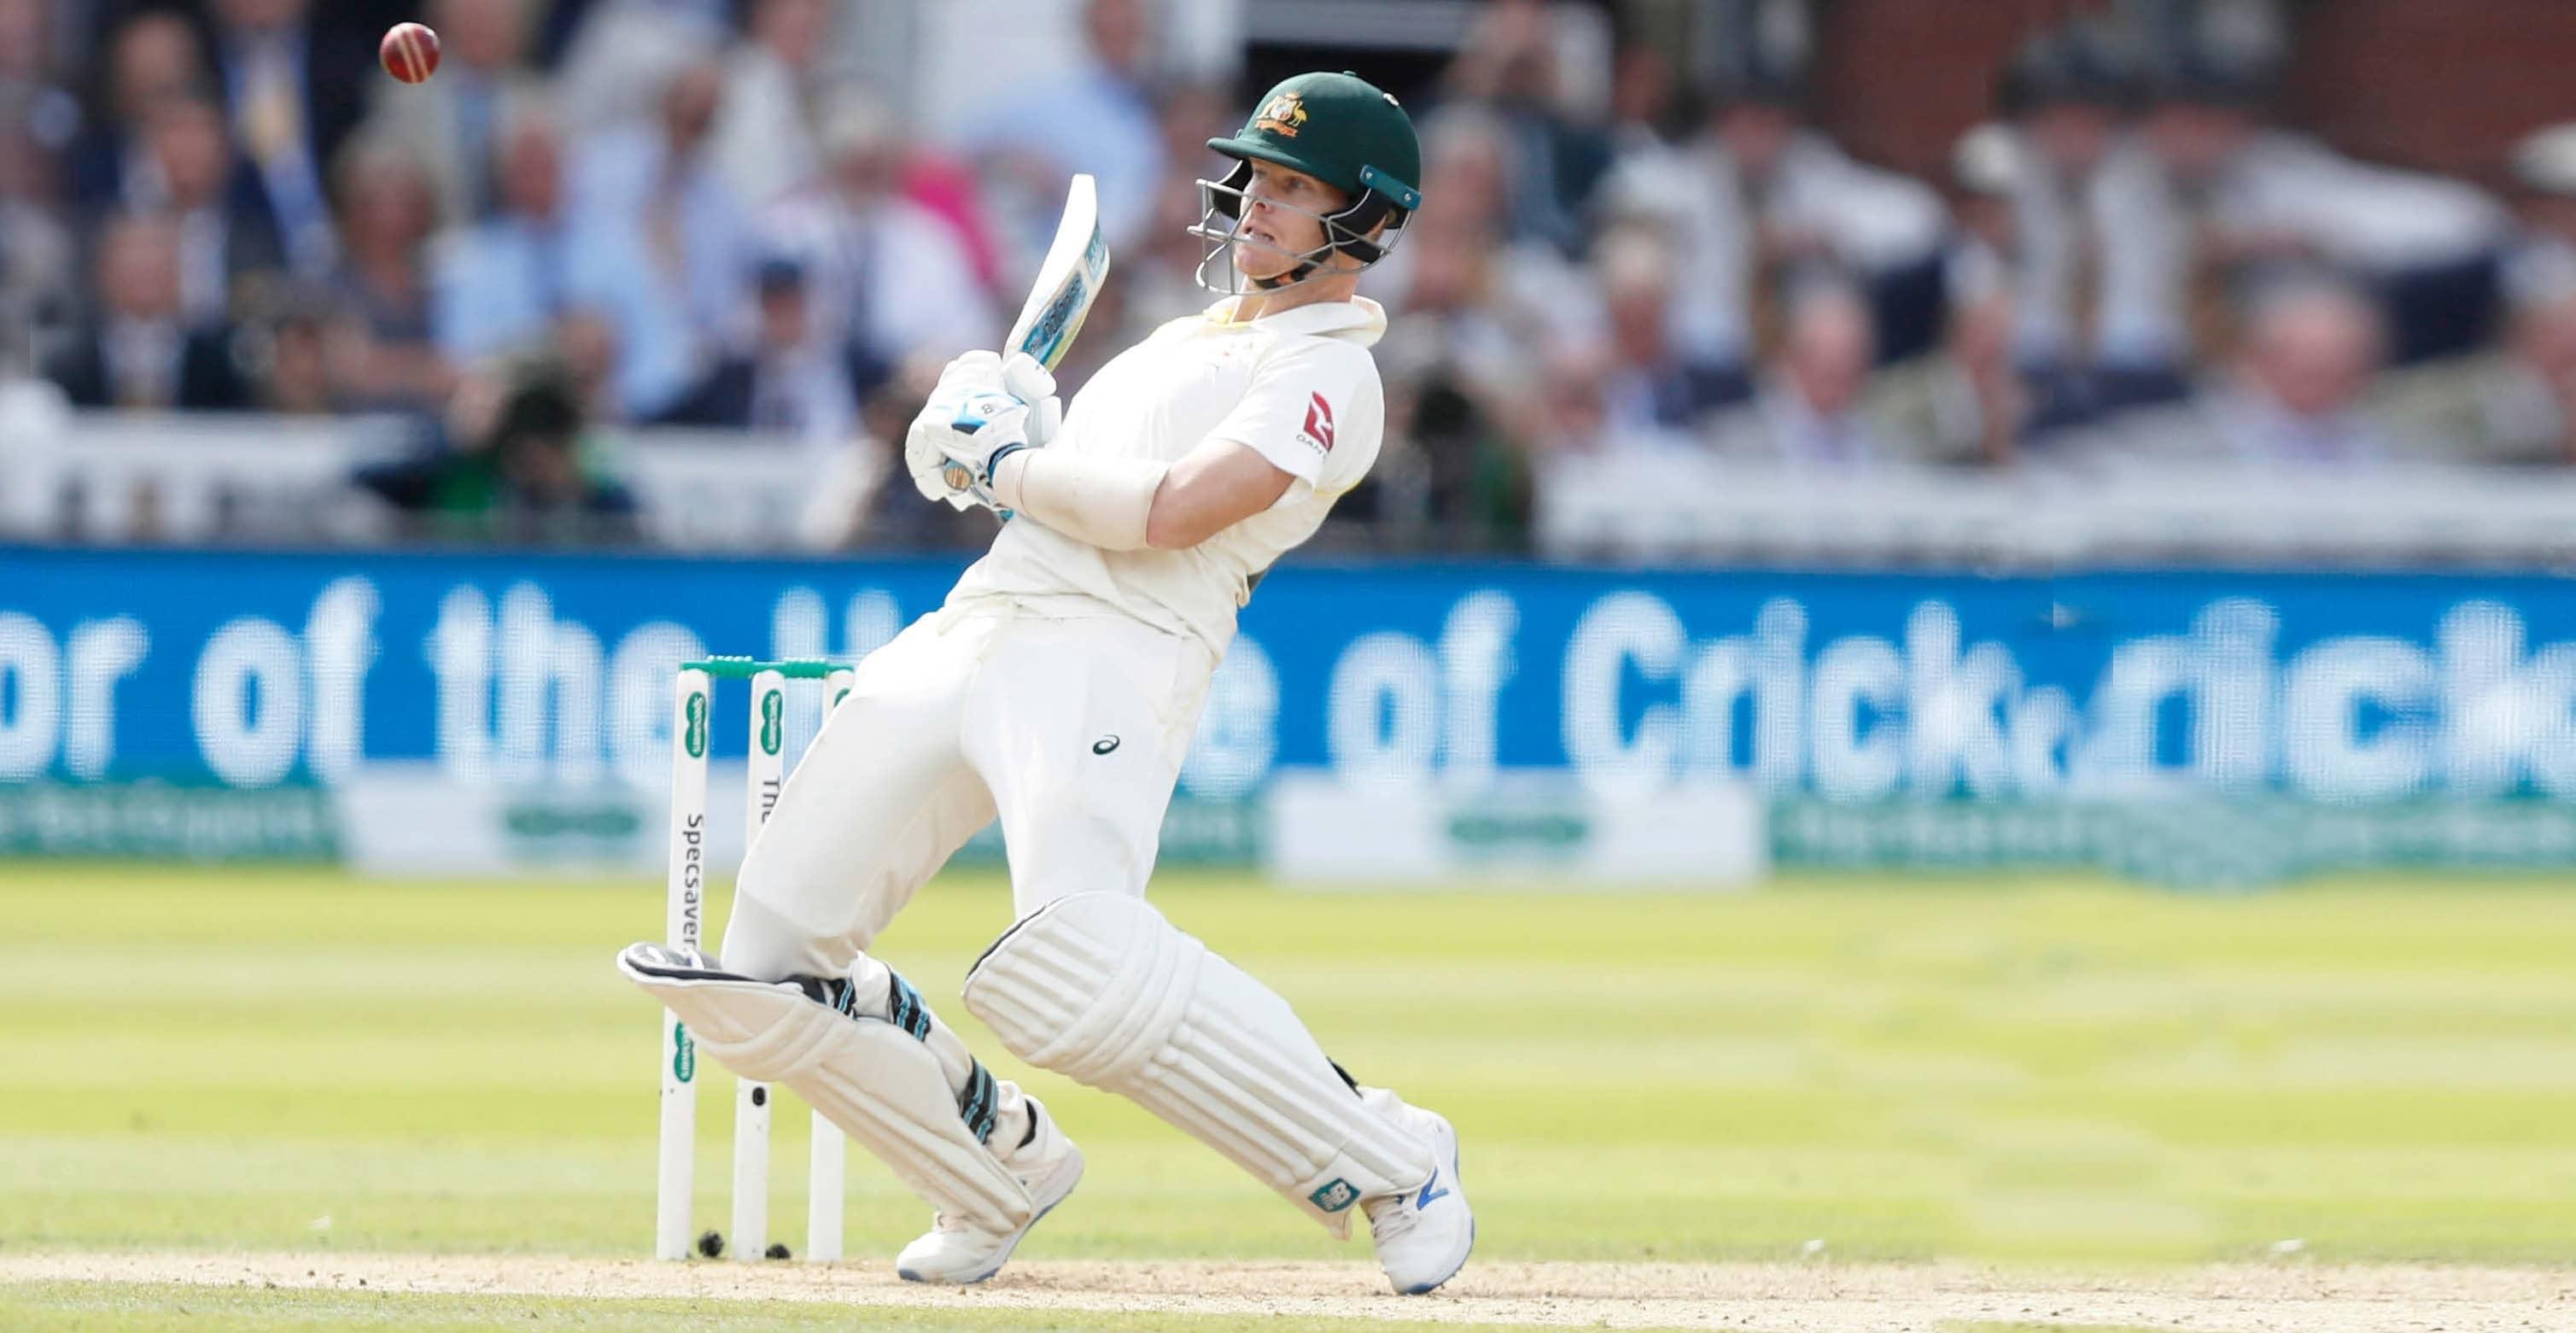 Smith-Kohli Rivalry Spices Up Test Championship